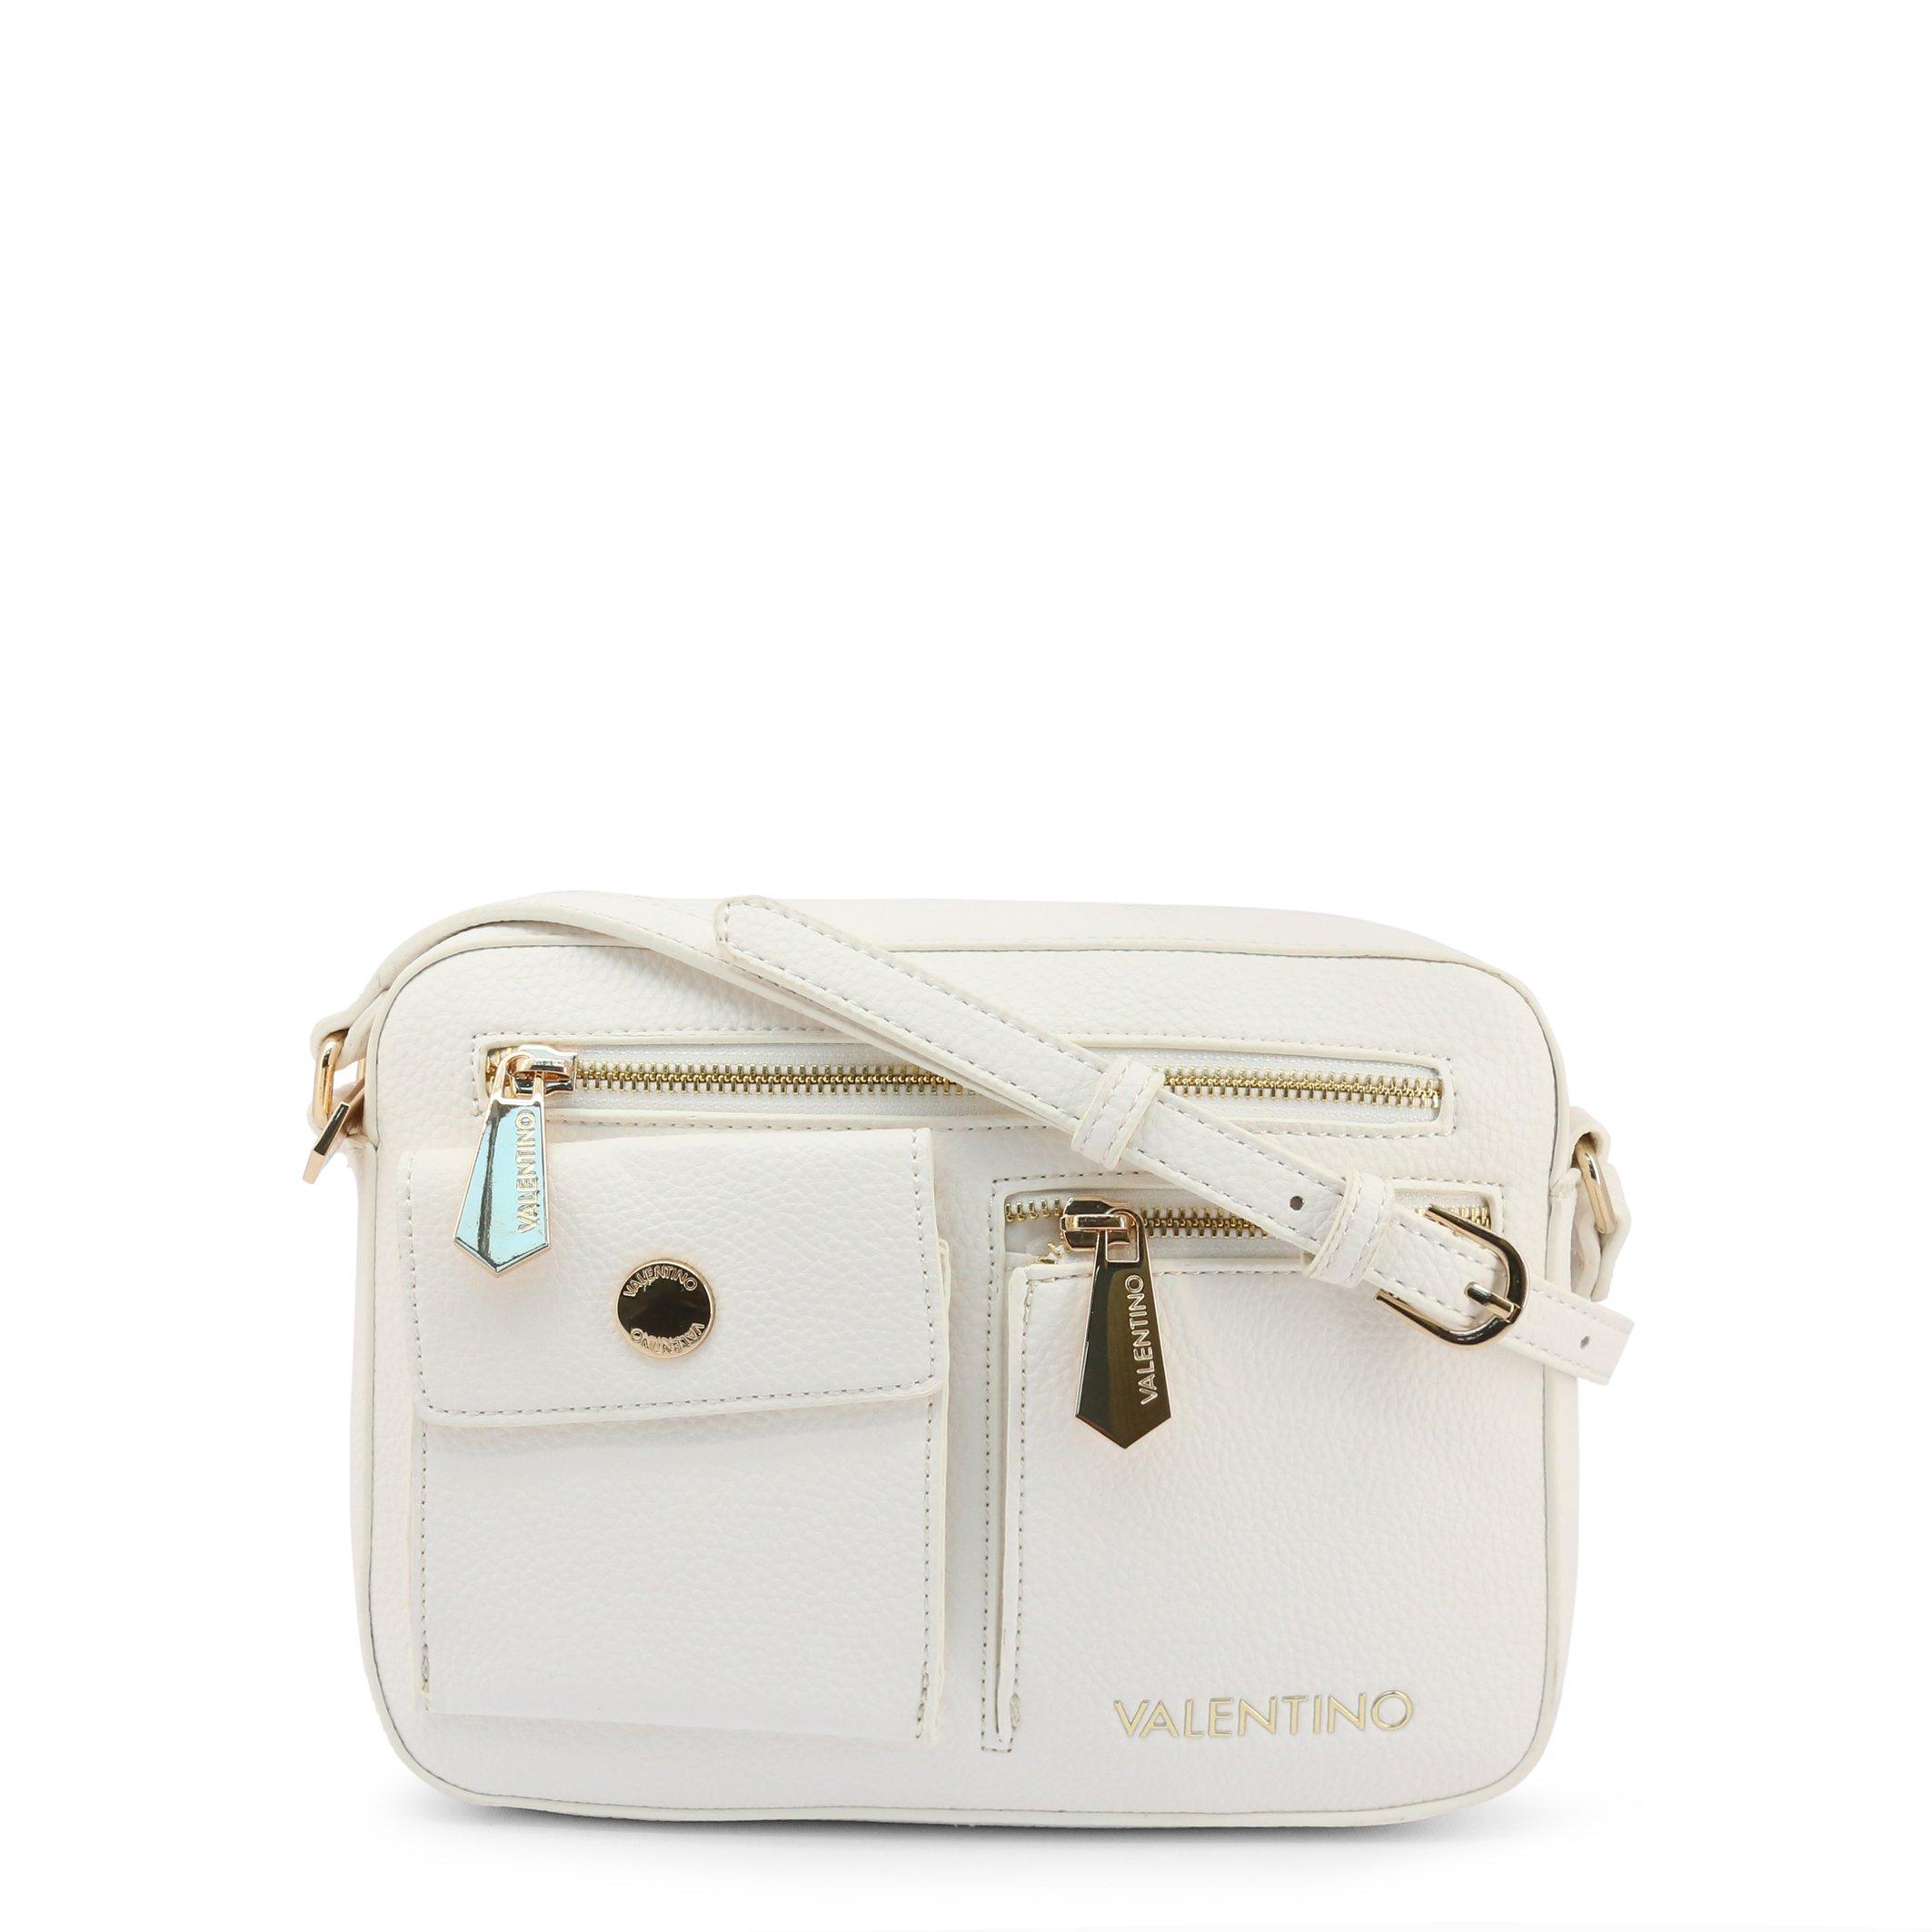 Valentino by Mario Valentino Women's Clutch Bag Various Colours CASPER-VBS3XL03 - white NOSIZE